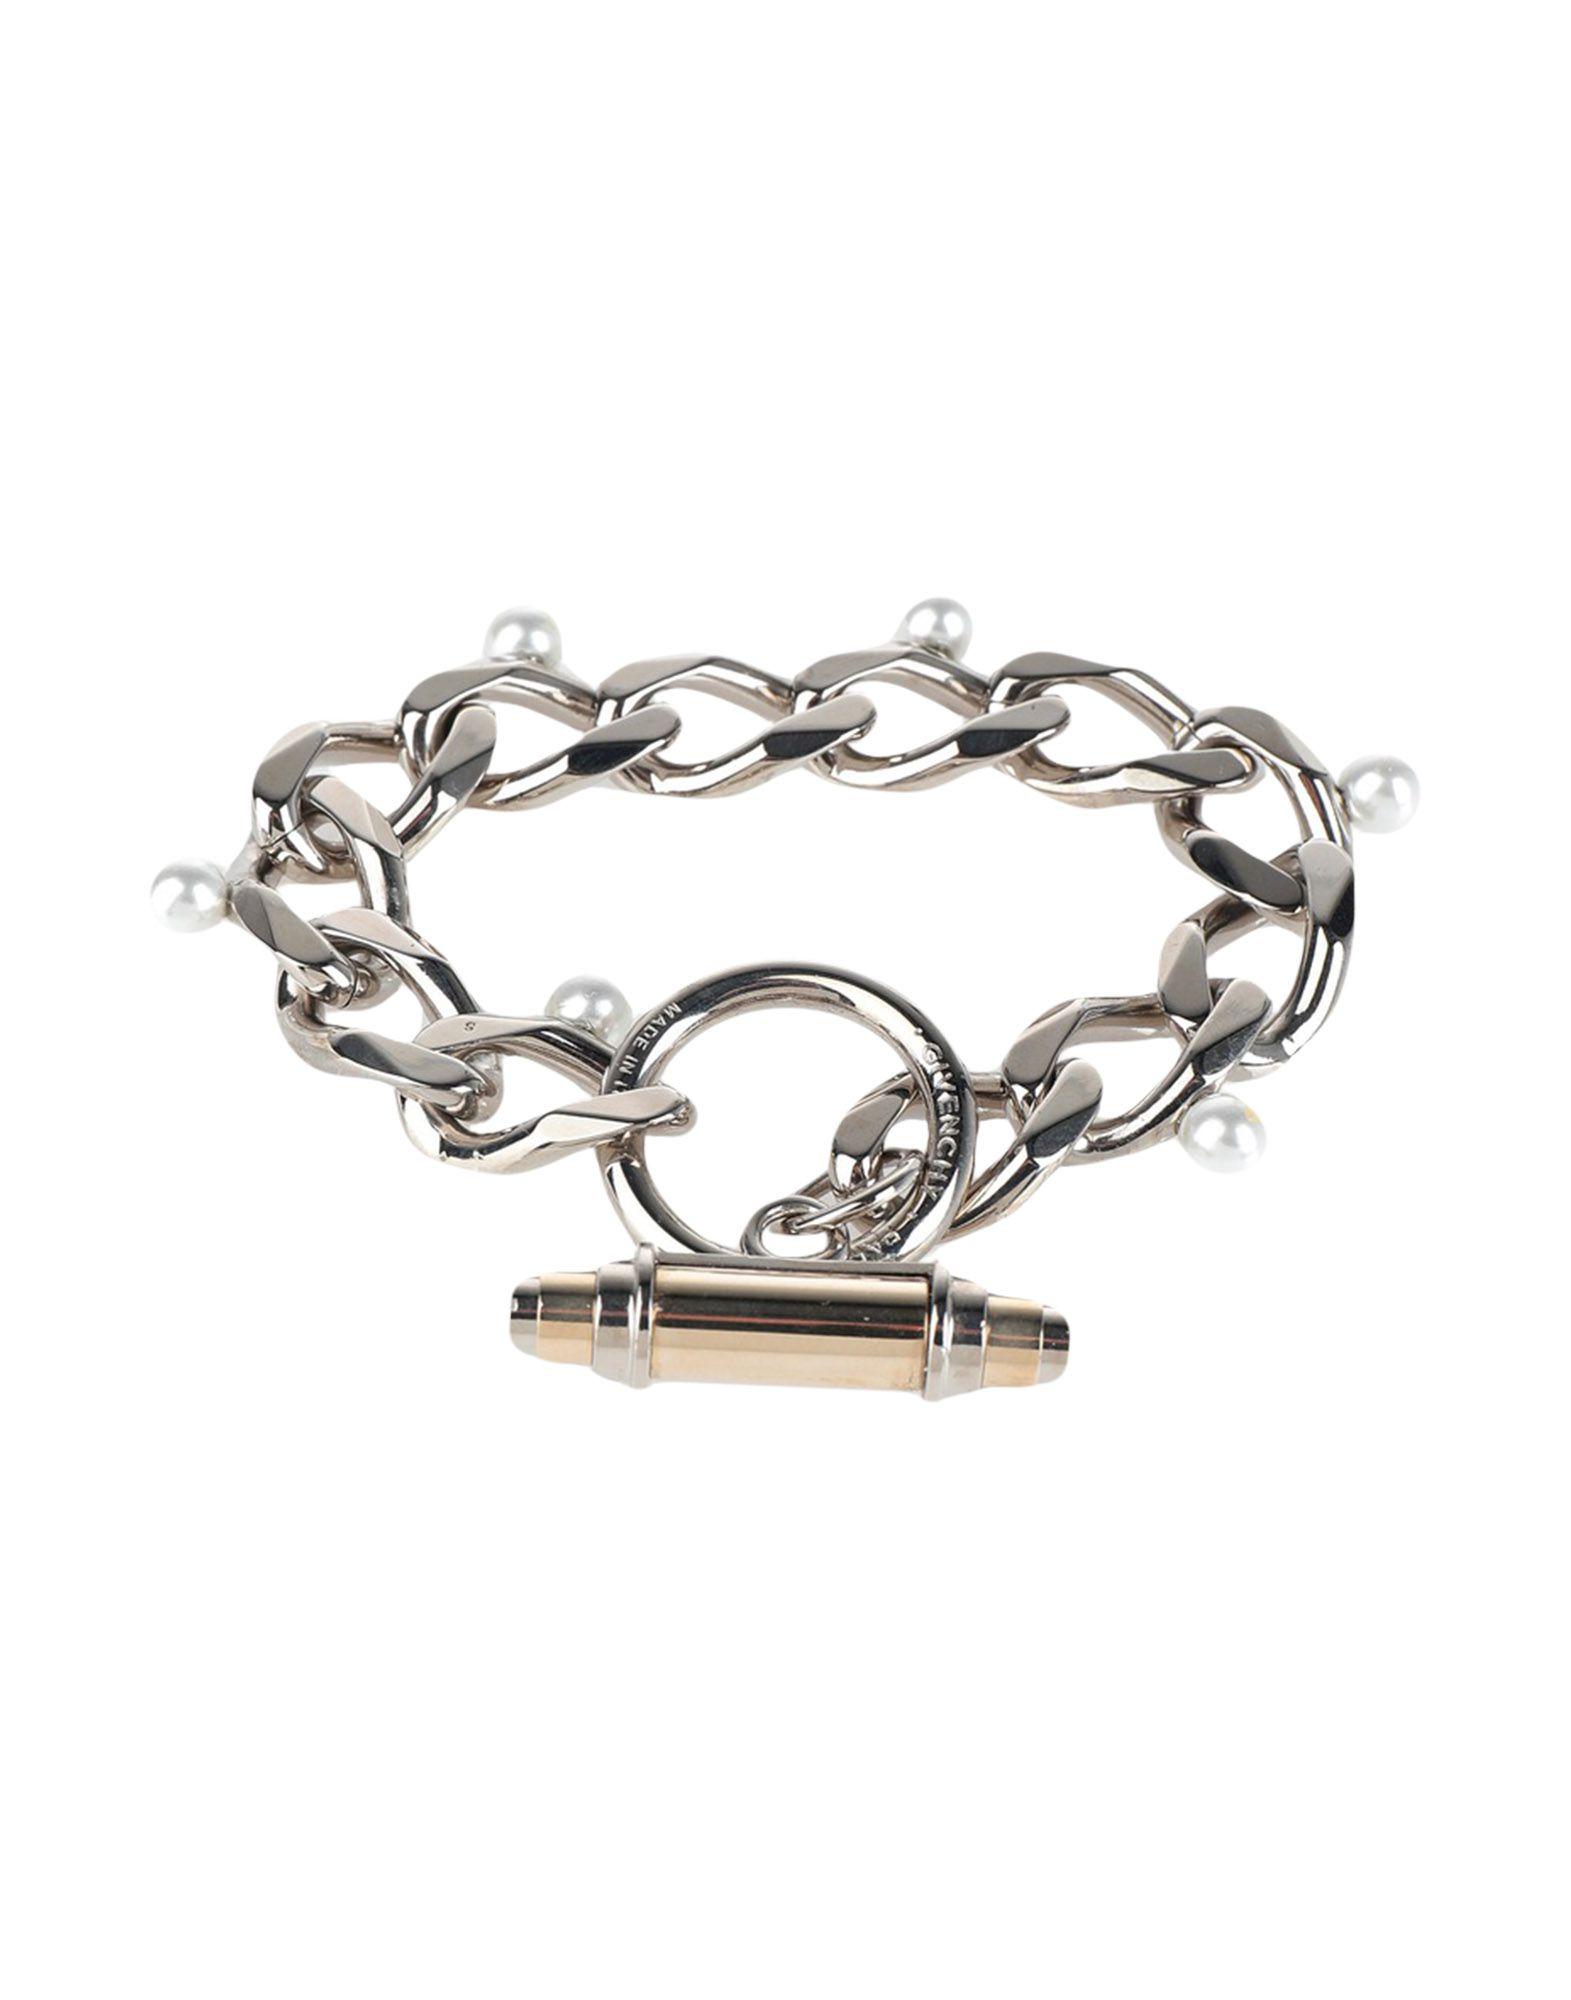 Givenchy Bracelet In Silver